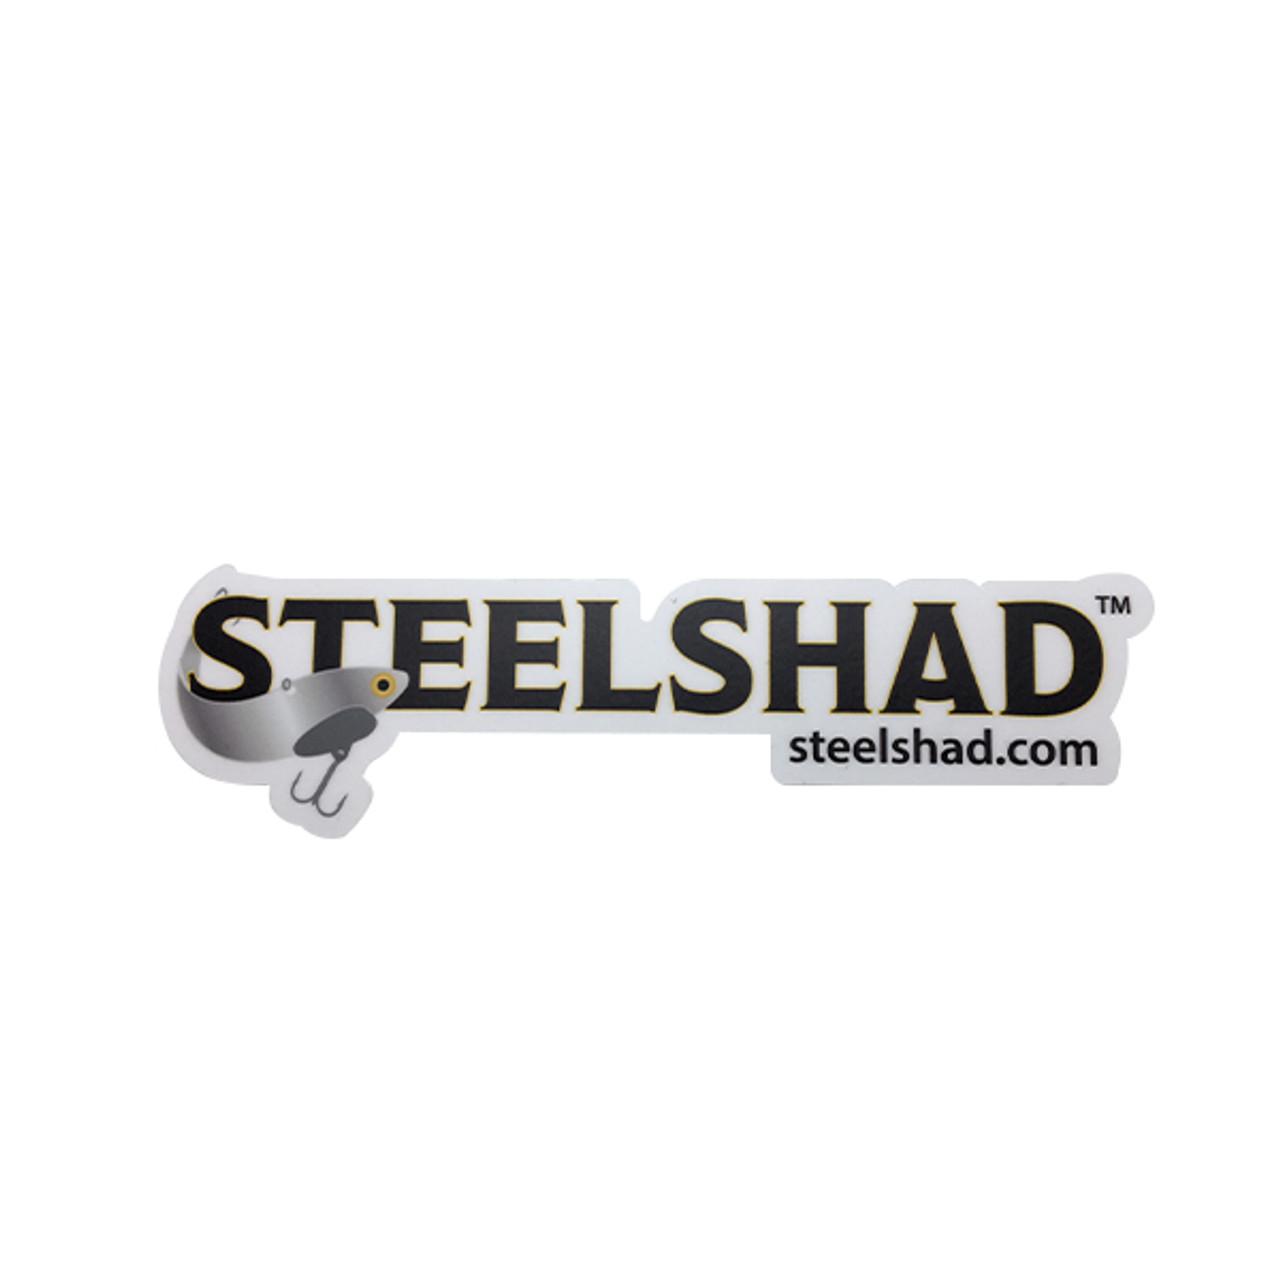 SteelShad Logo Sticker - Large